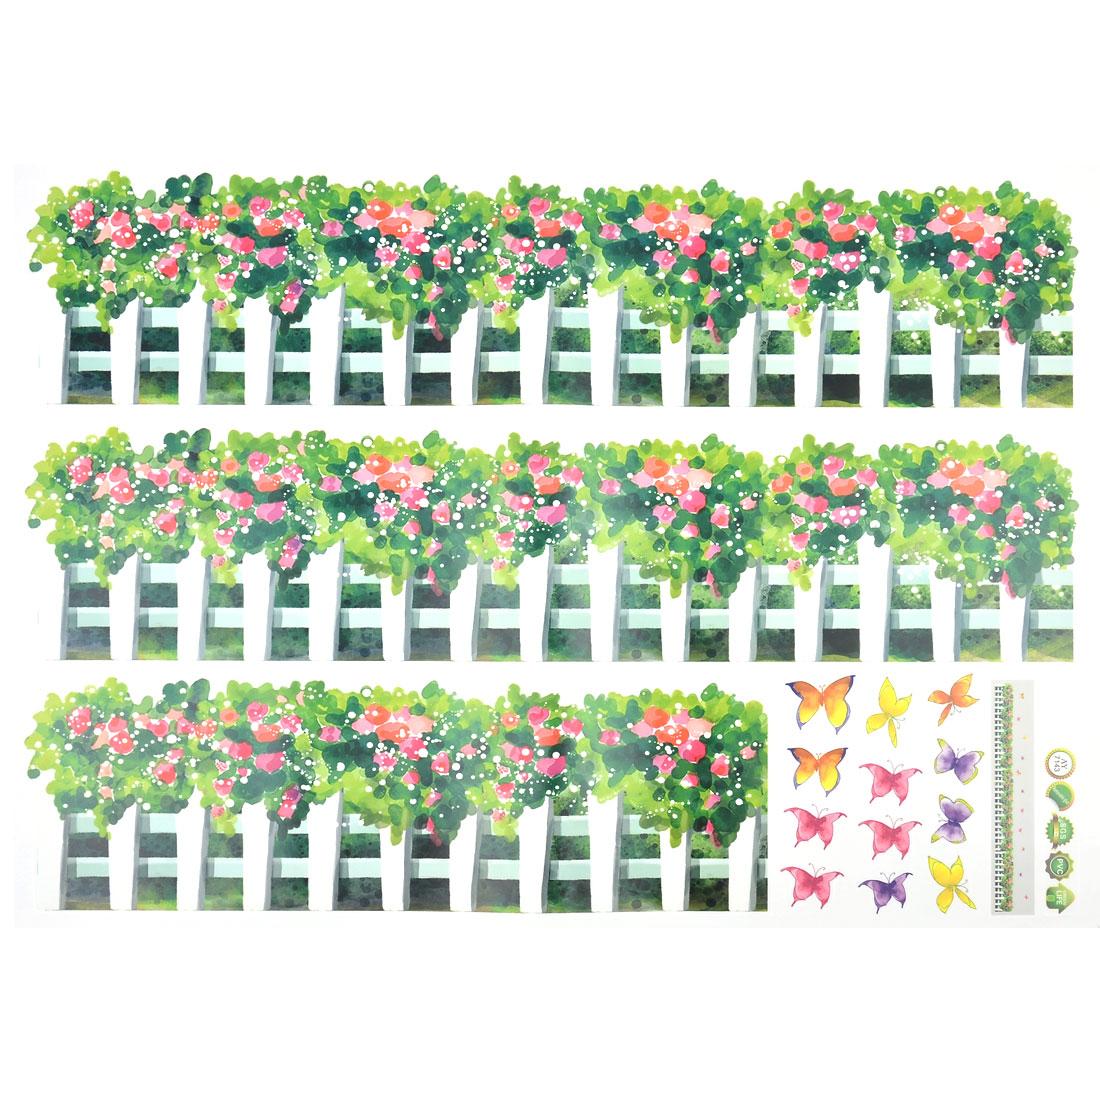 Room Decor DIY Fence Flower Pattern Waterproof Wall Sticker Decal Mural 70x50cm